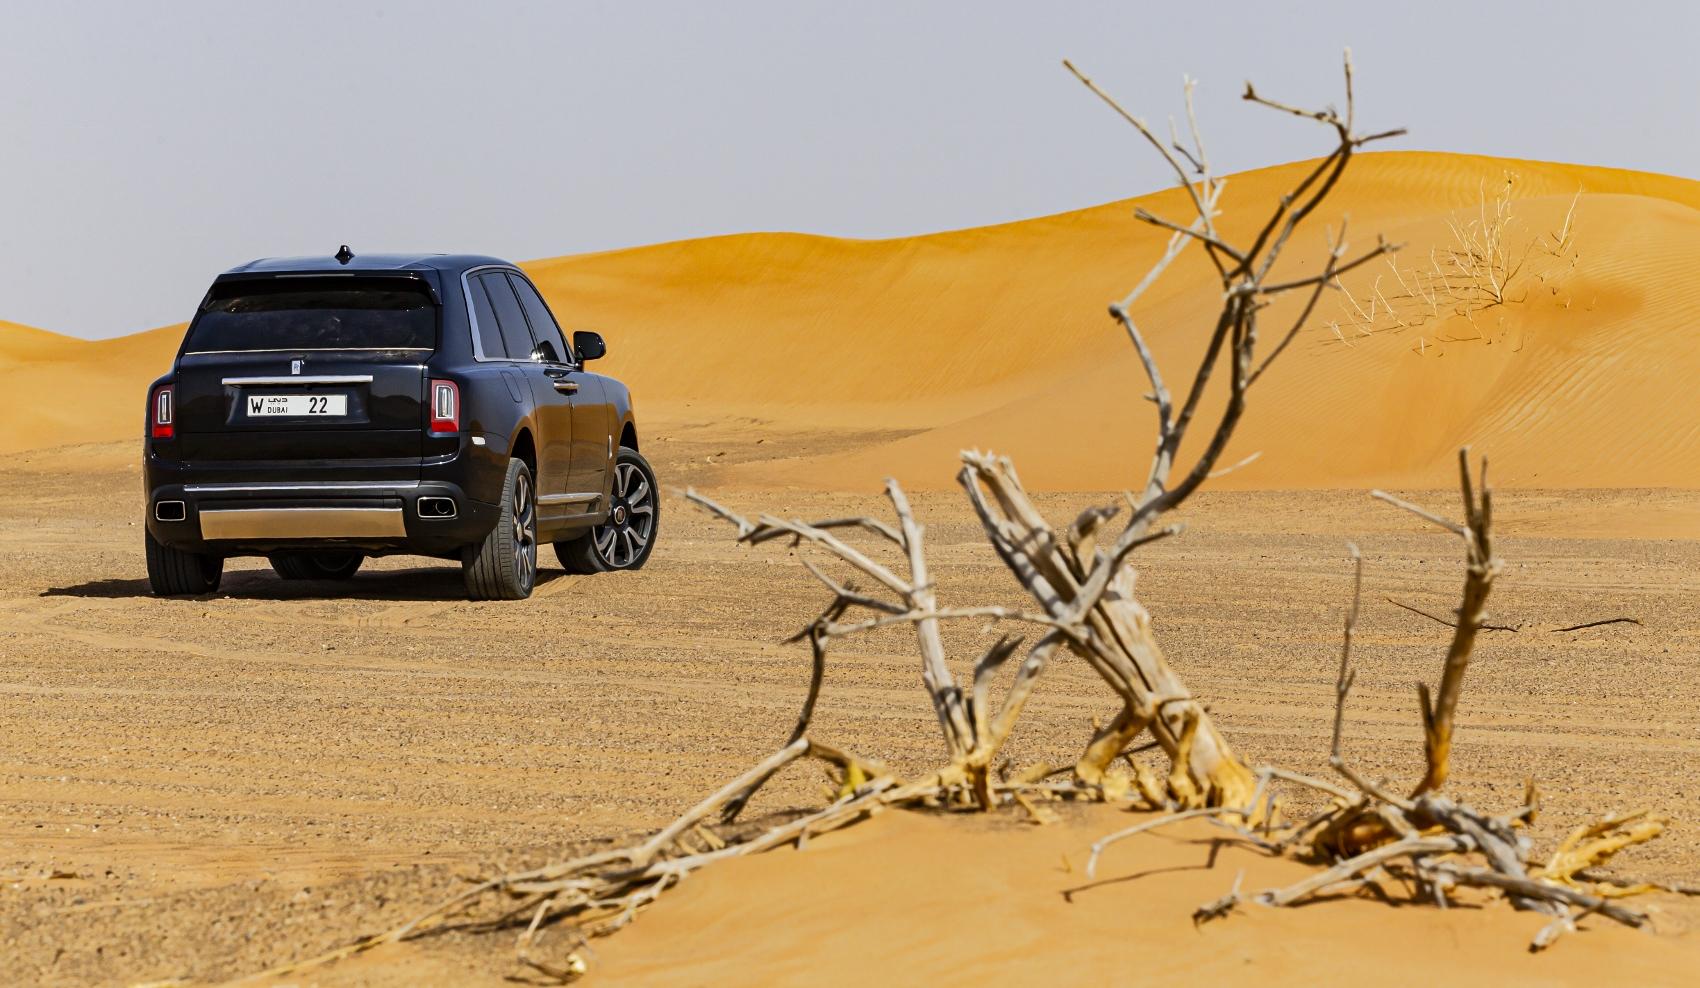 Rolls Royce Cullinan sa predviedol na púšti. Pozrite si foto aj video YYKdprmp3B rolls-royce-cullina